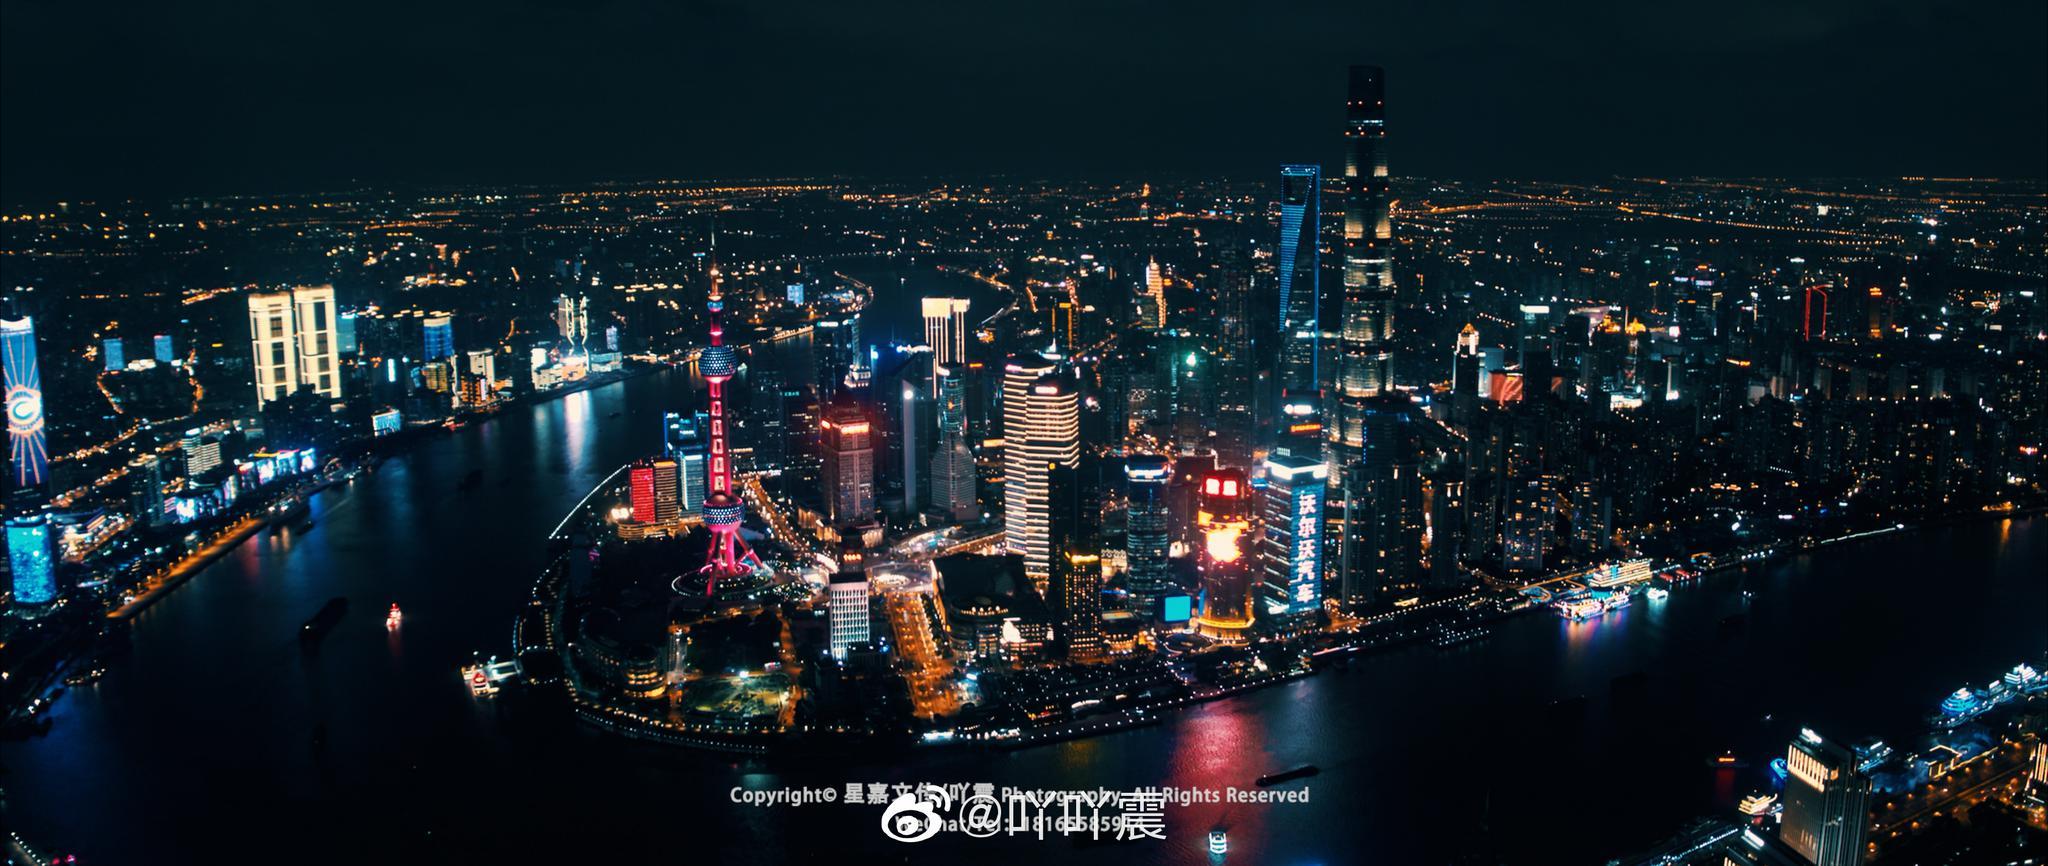 I上海 @DJI大疆创新 @500px摄影社区 @中国摄影师联盟